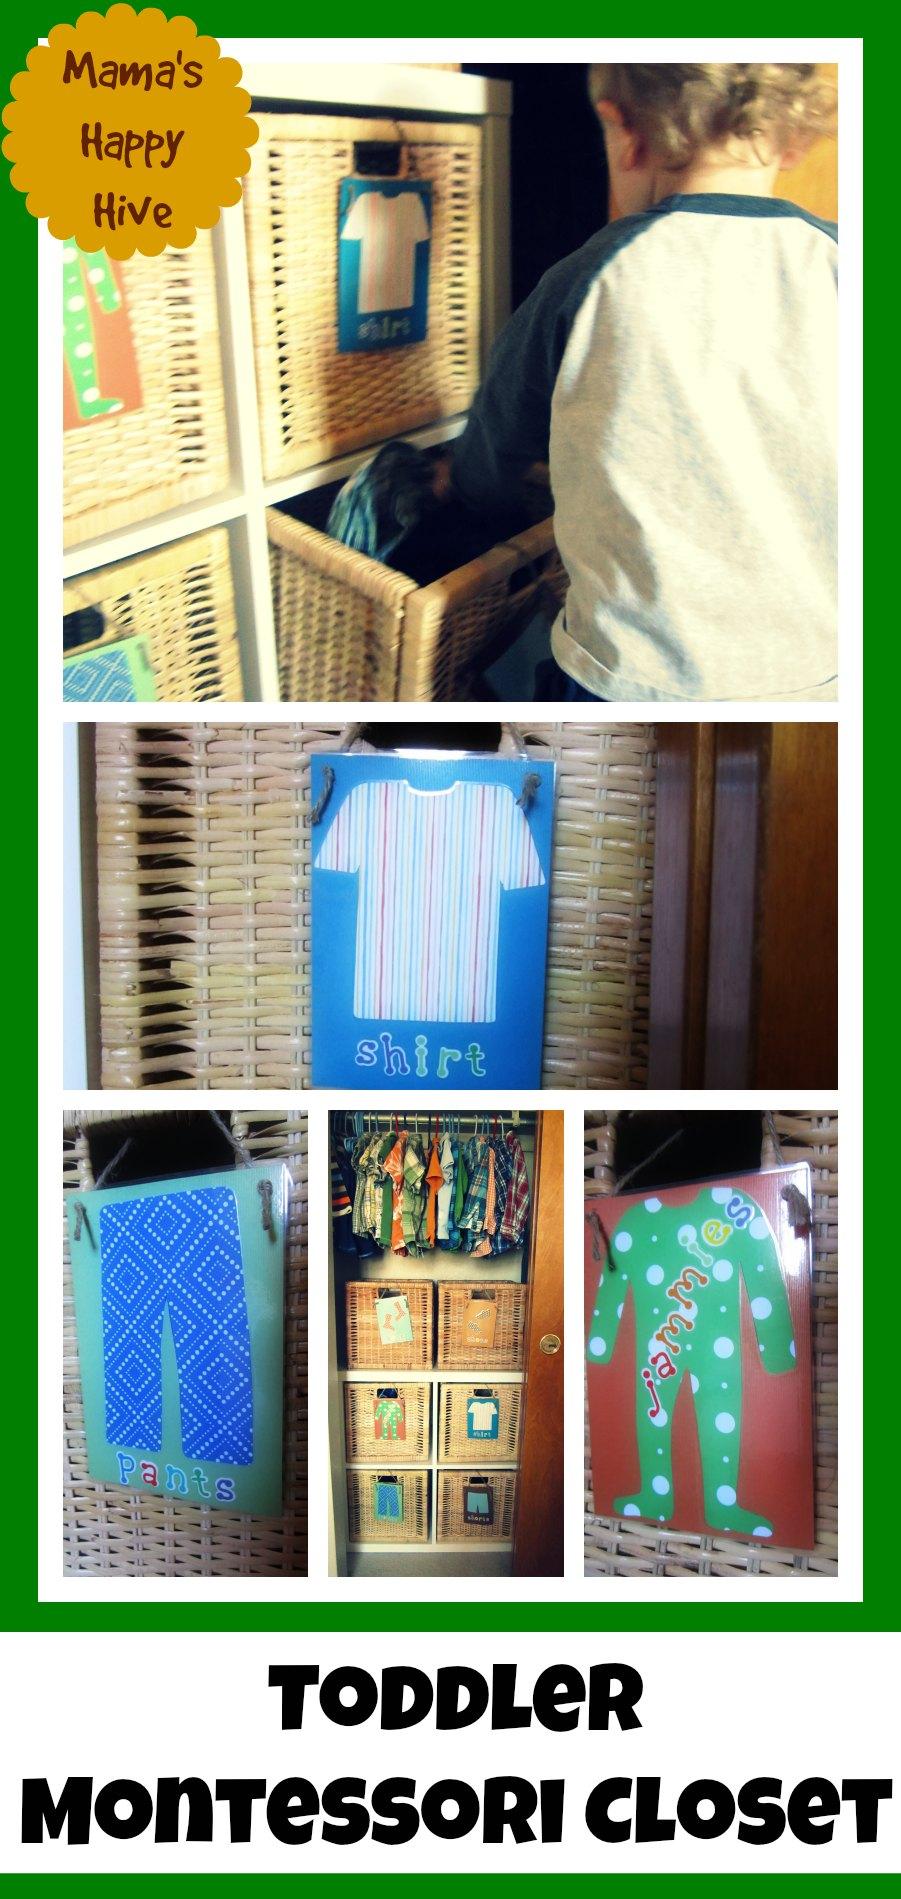 Tot Montessori Closet - www.mamashappyhive.com